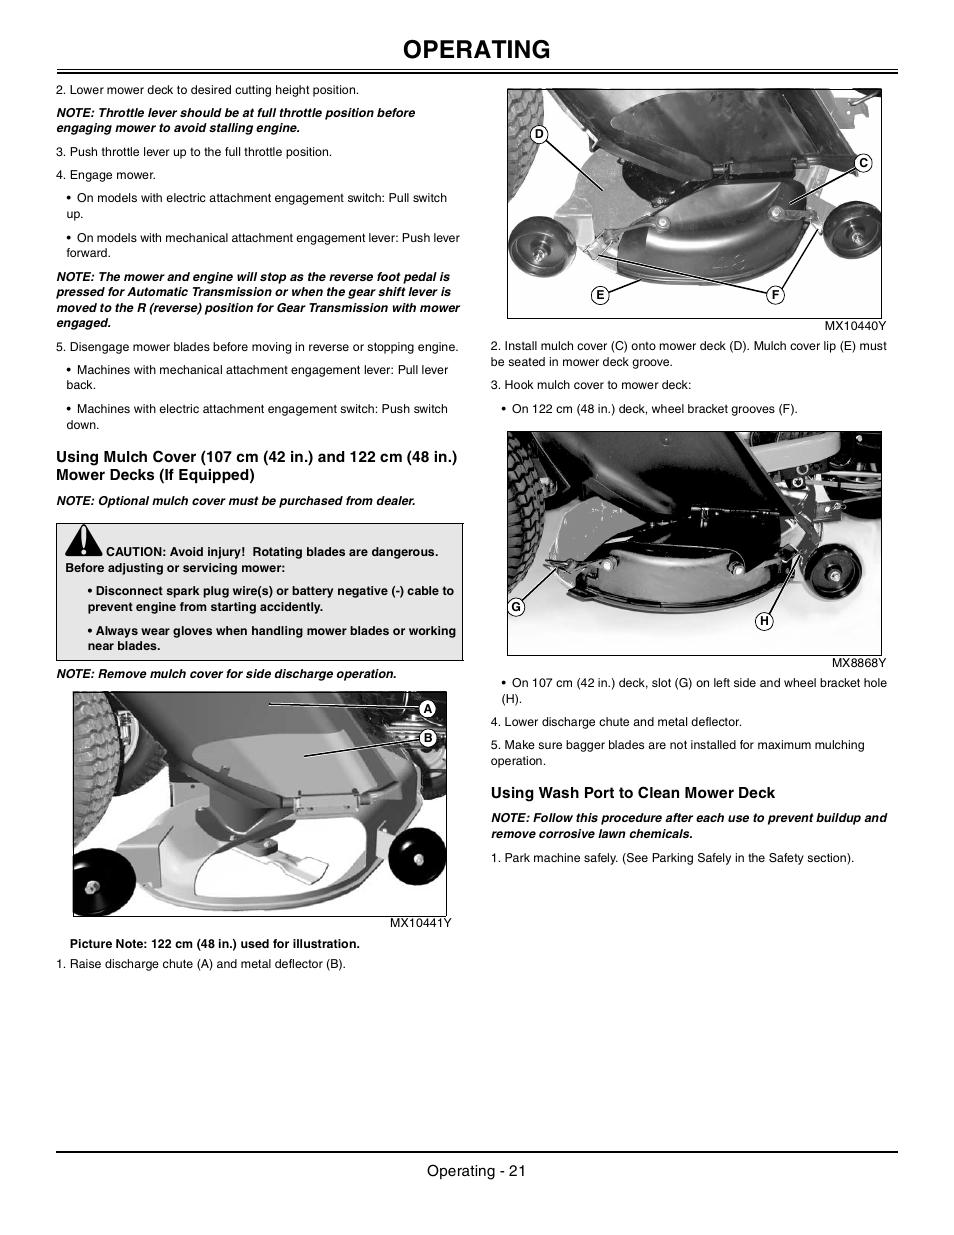 Using wash port to clean mower deck, Operating | John Deere Tractor 100  Series OMG X23532 J0 User Manual | Page 22 / 56